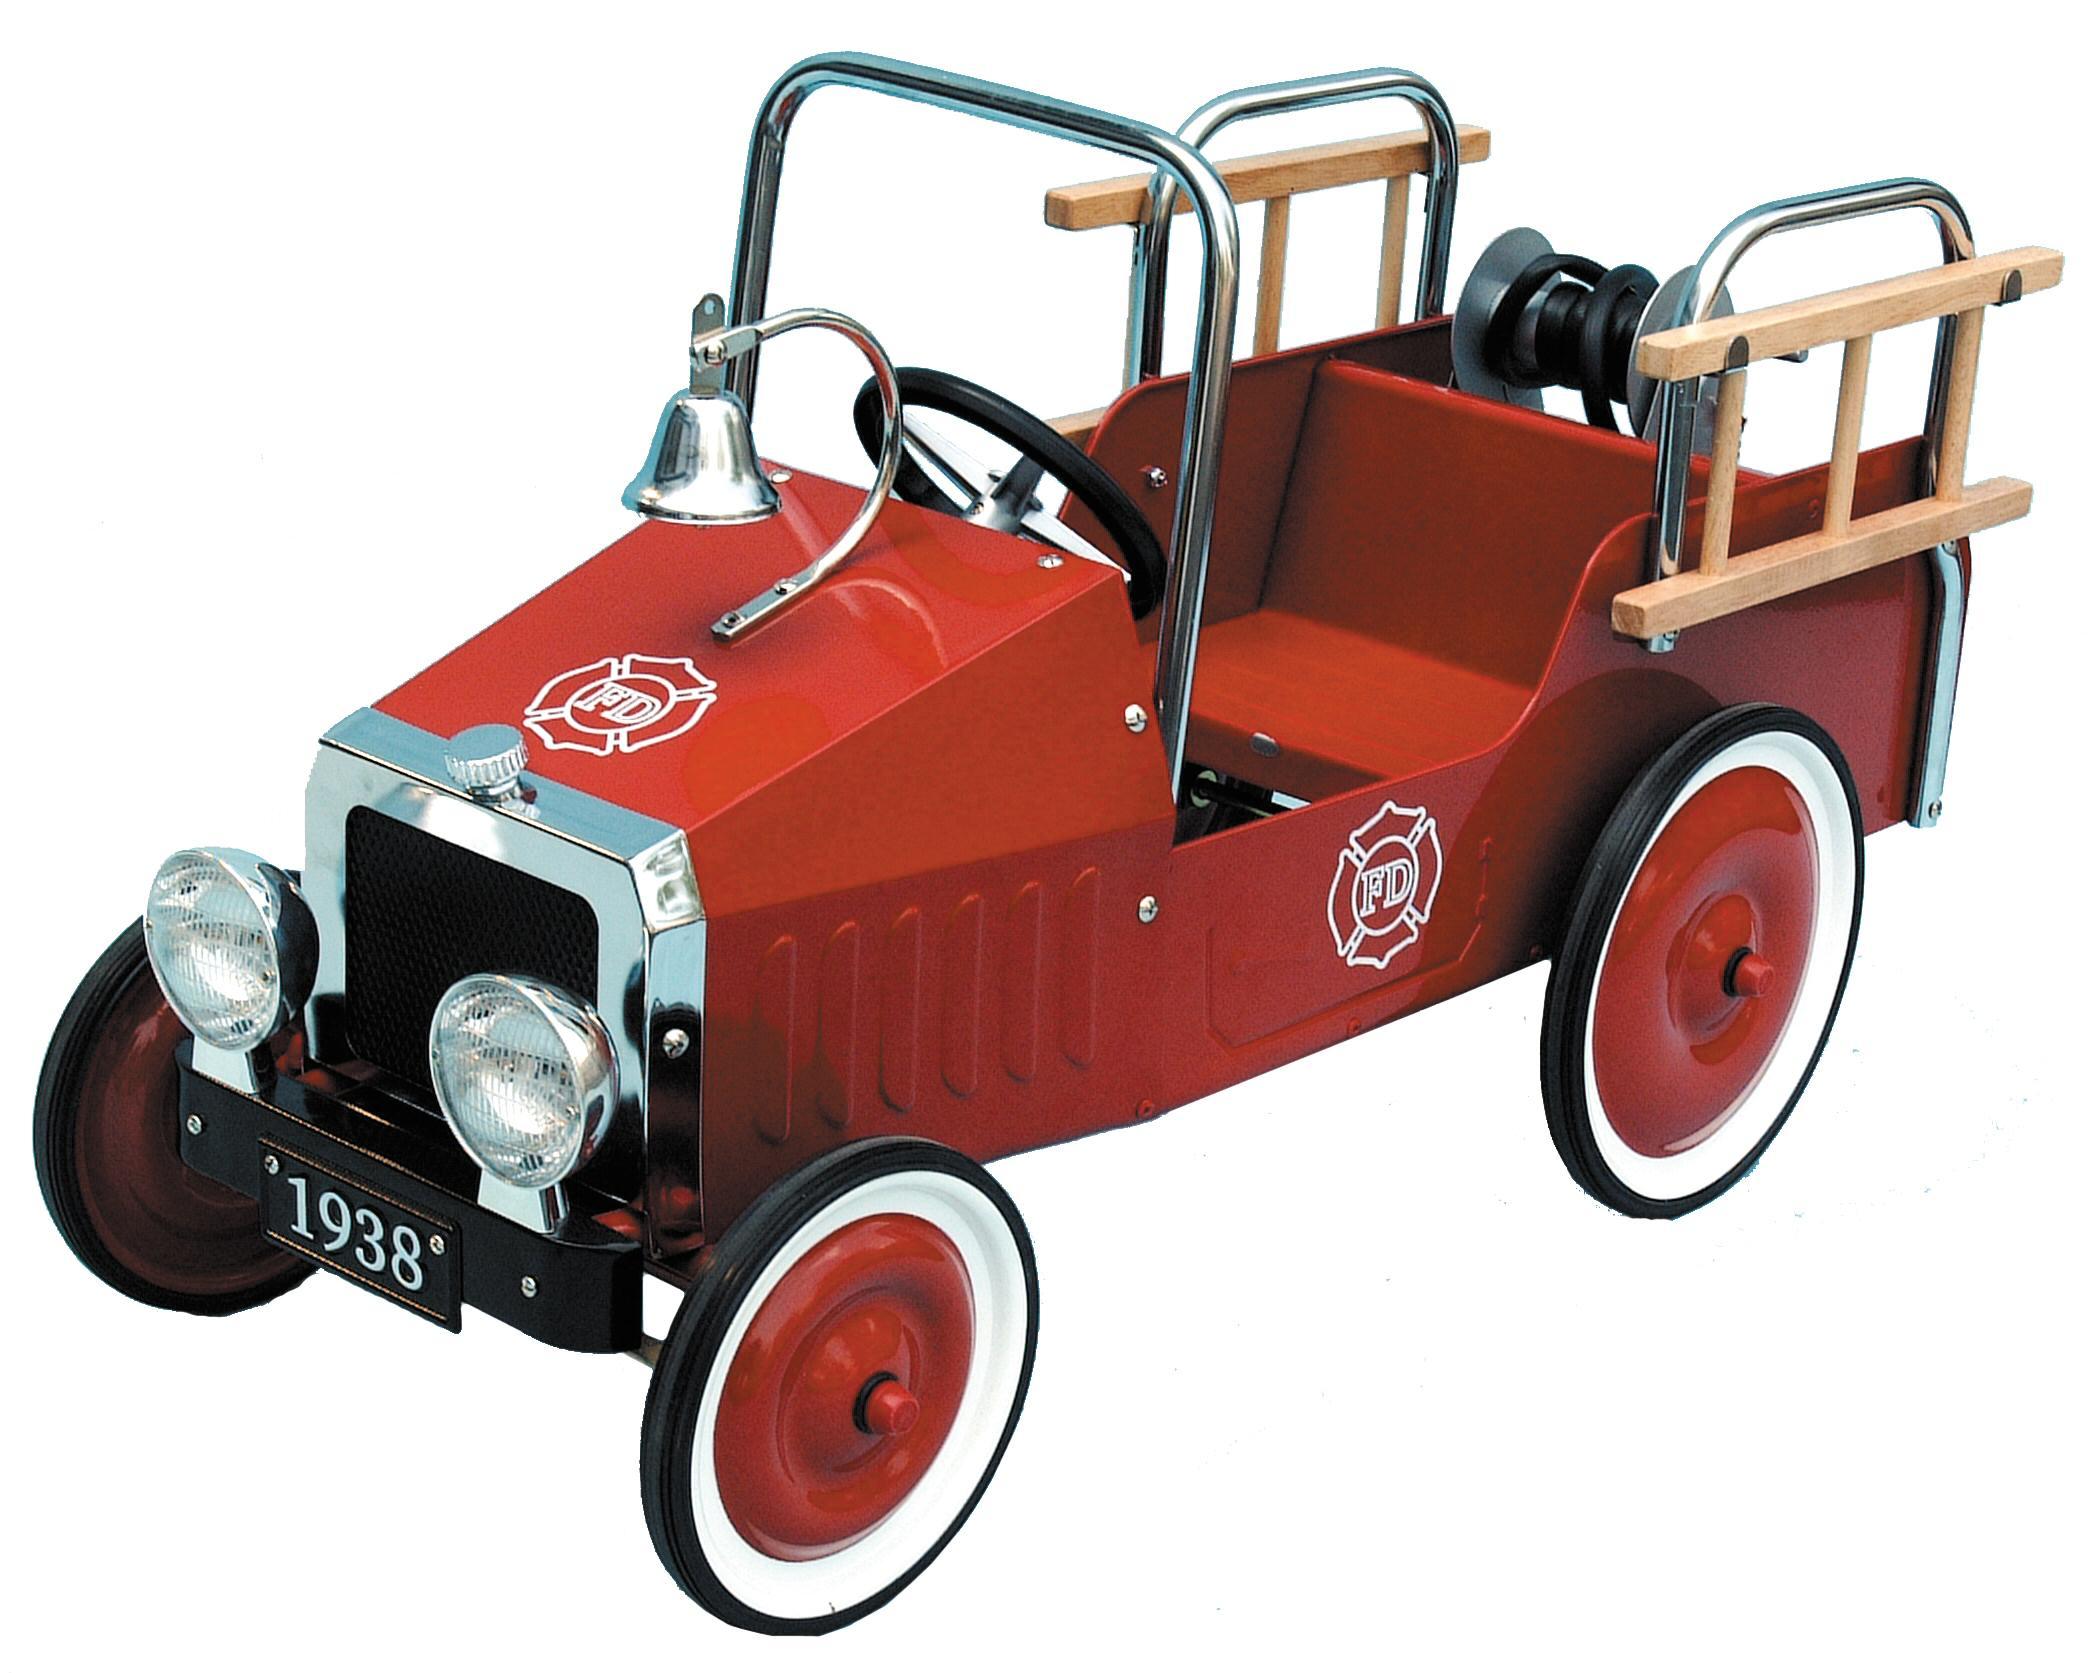 1938 Classic Fire Engine Pedal Car